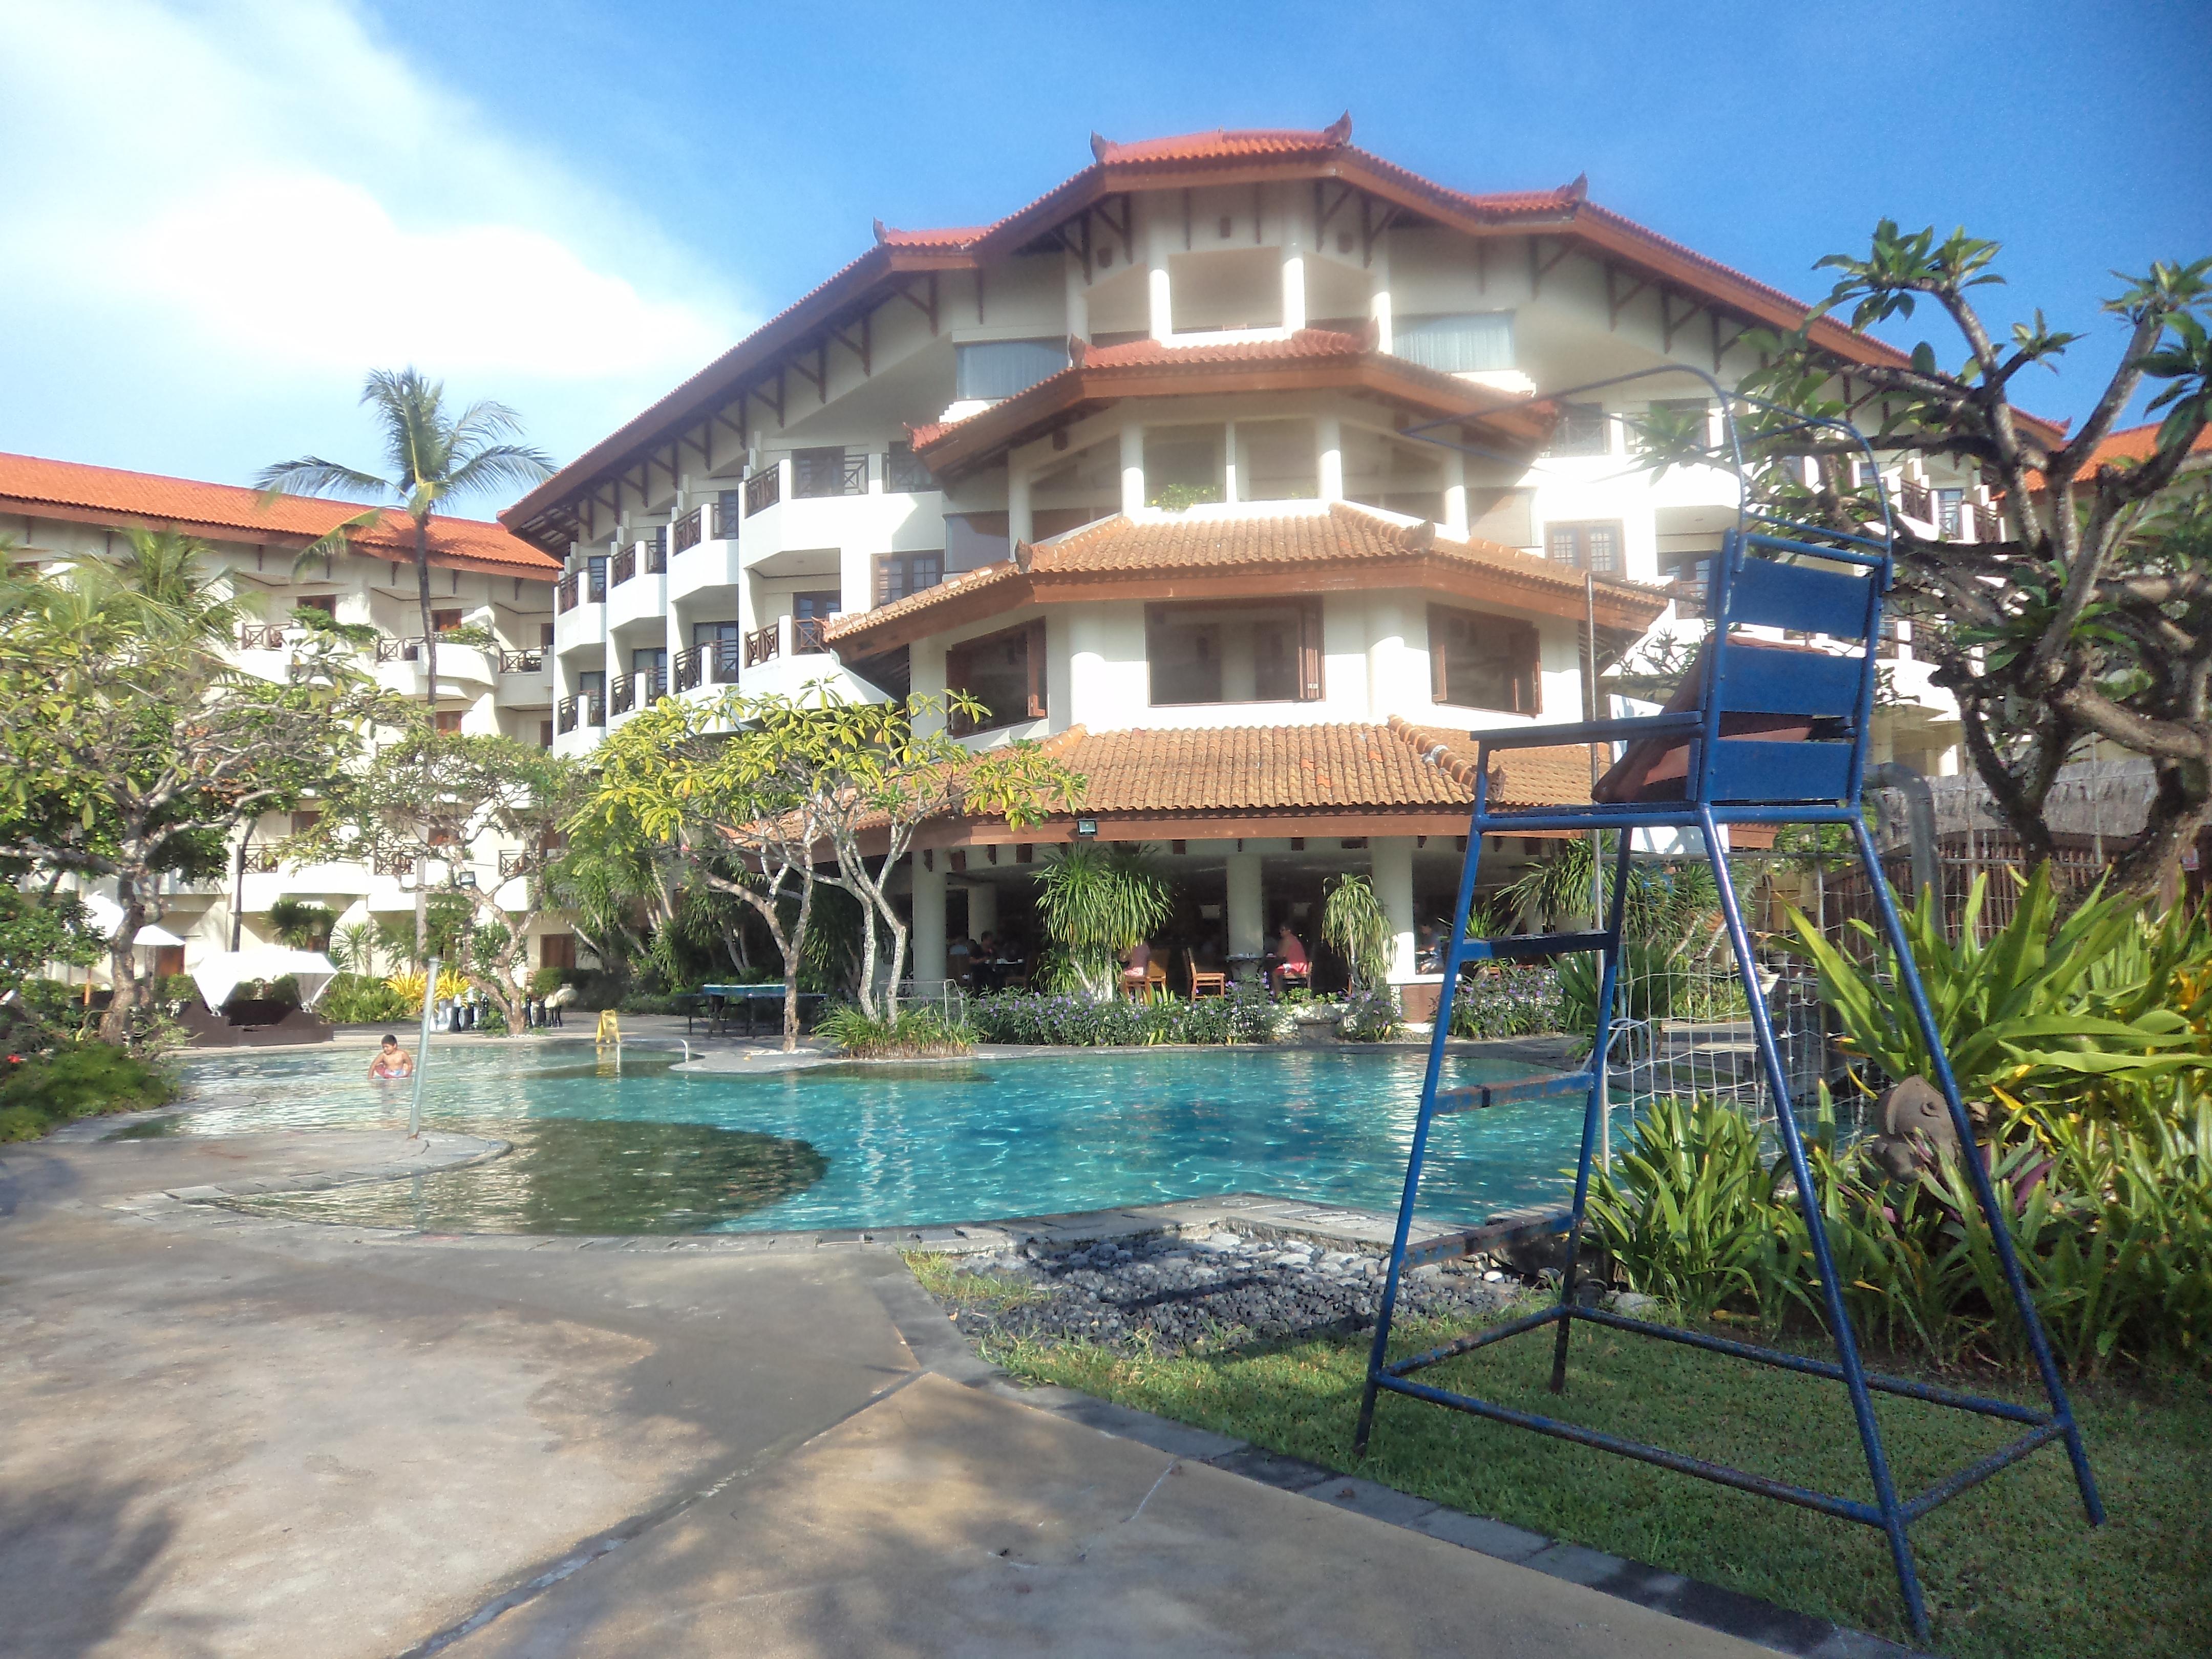 Hotel Grand Mirage, Nusa Dua, Bali